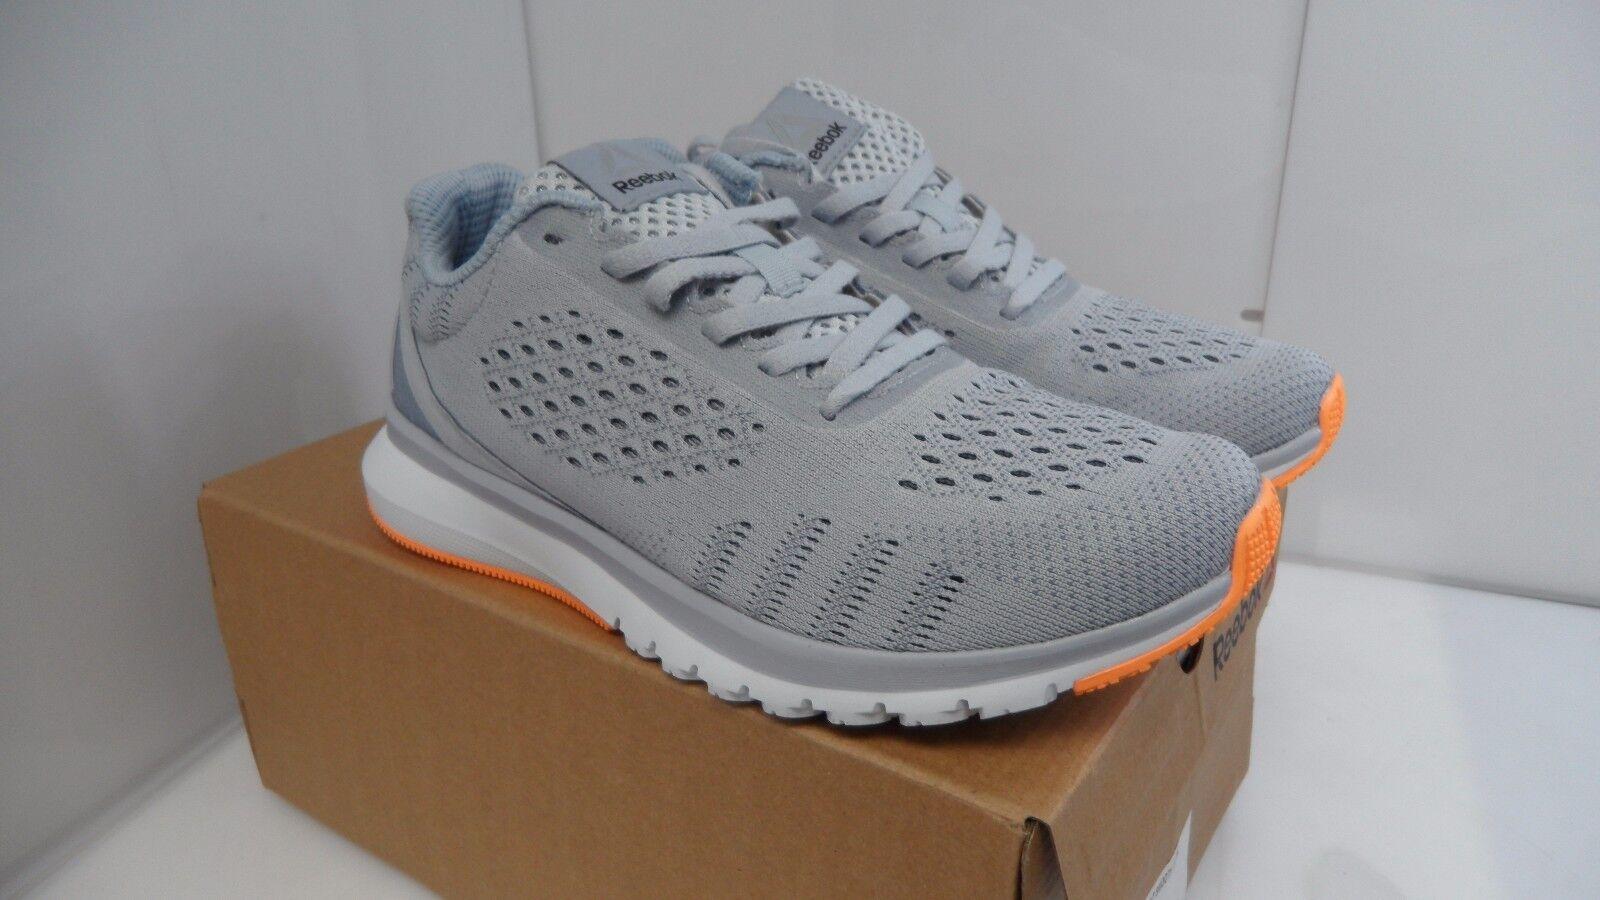 Reebok Women's Print Smooth Ultraknit Running Shoes 6.5 US Grey